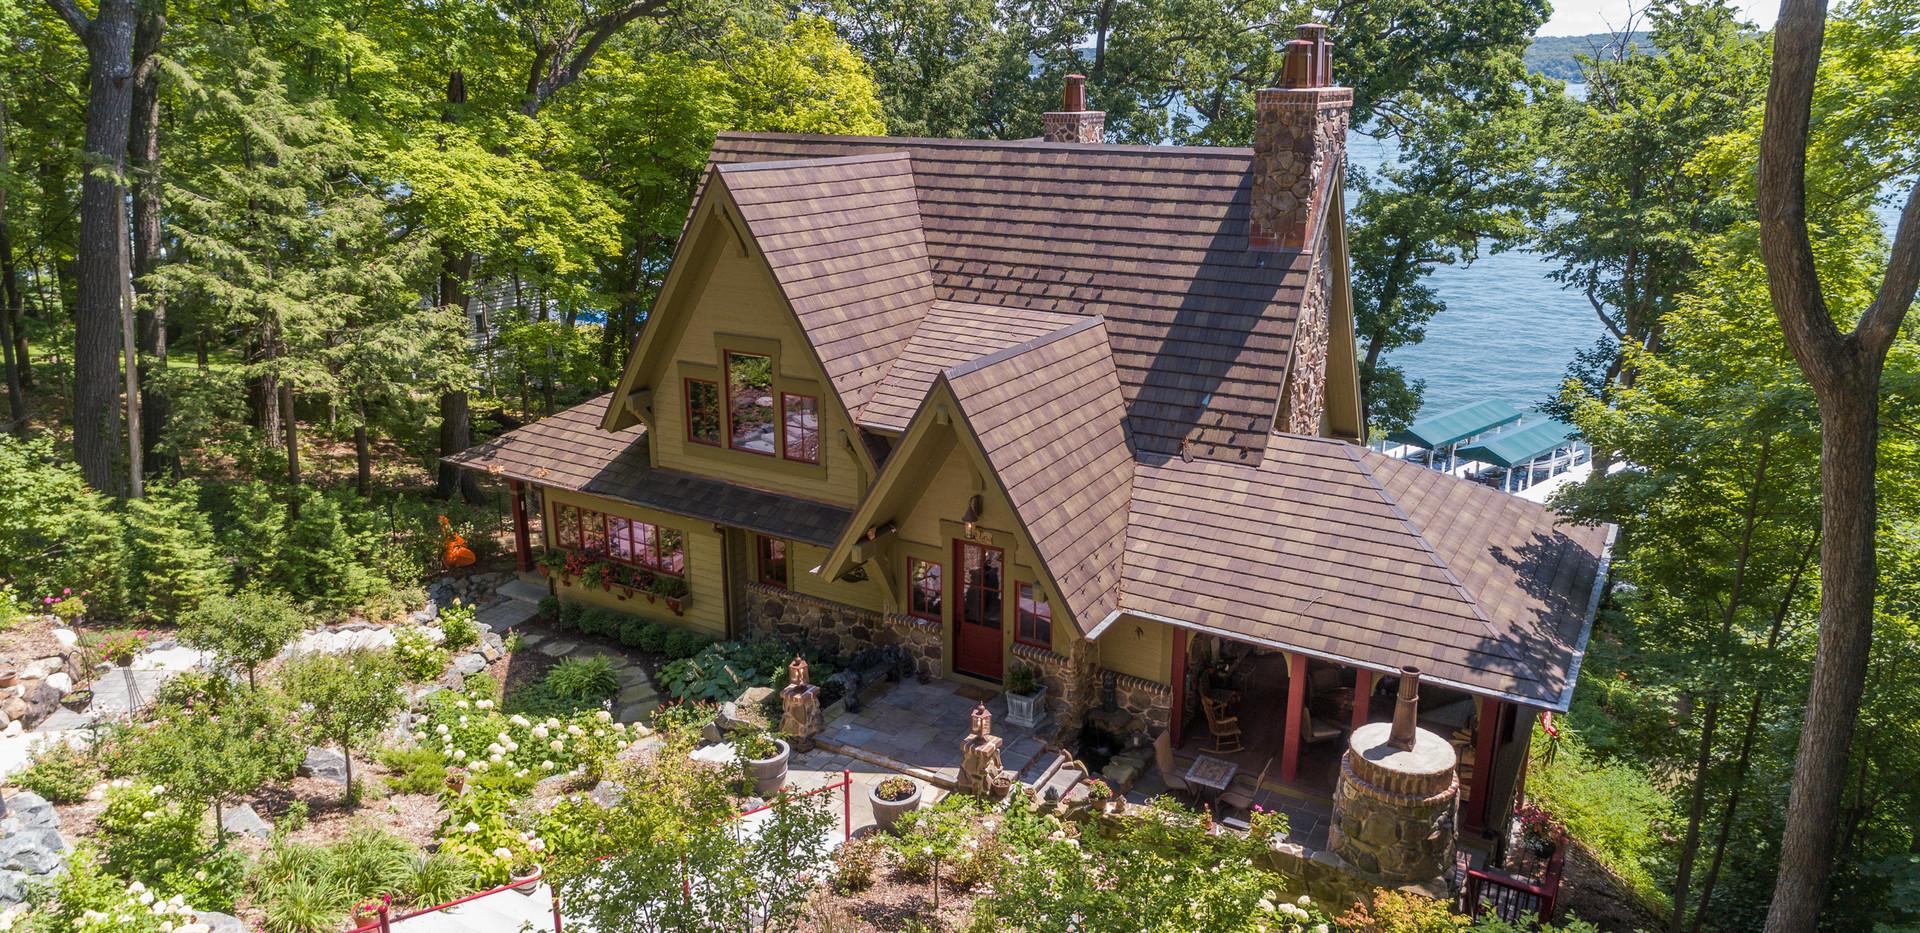 4.1 Million Dollar Home for sale on Gene